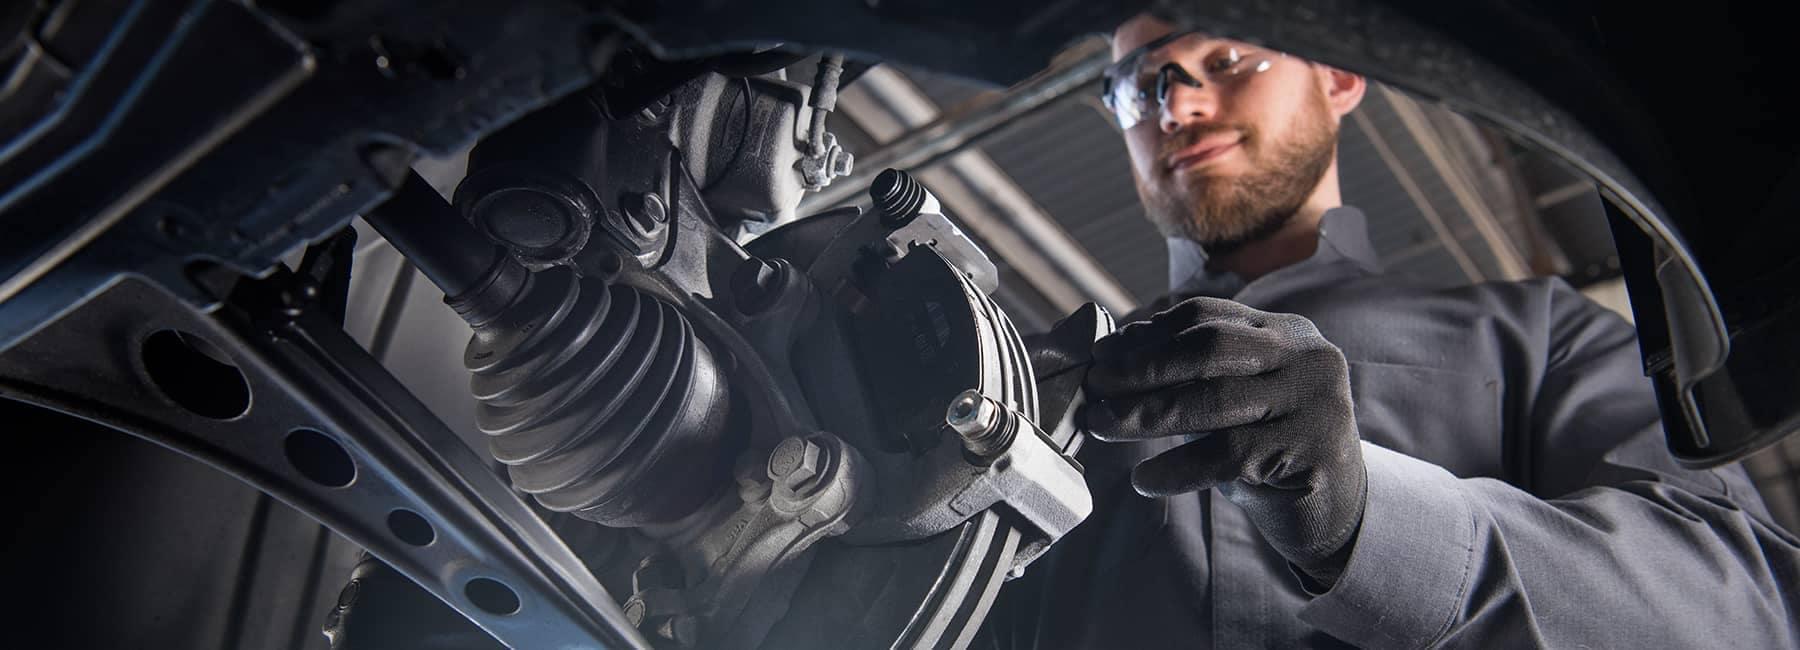 technician installs new brake pads